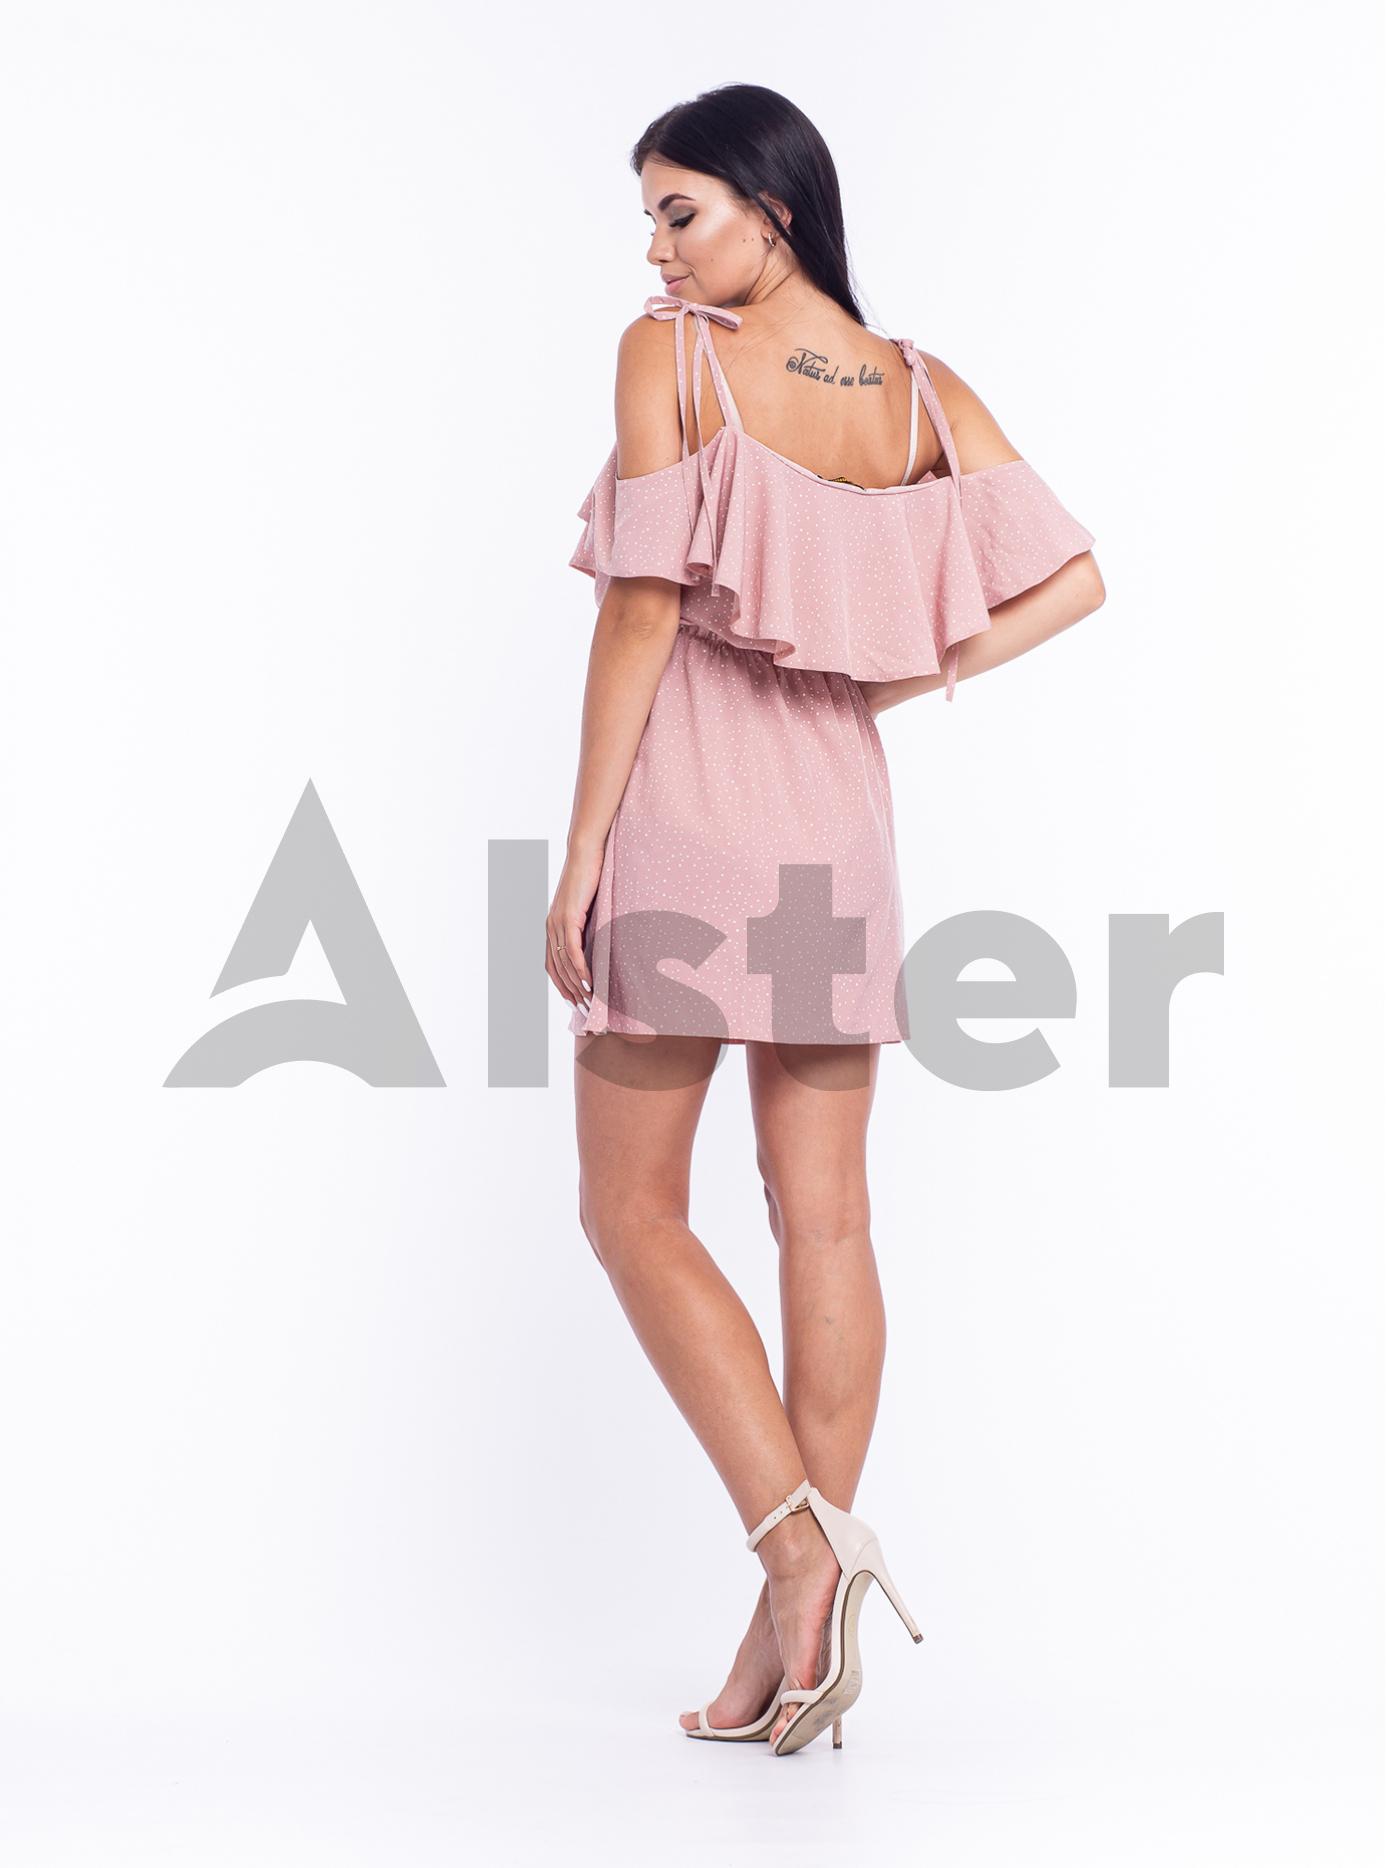 Платье Volan Пудра 46 (04-8987973): фото - Alster.ua